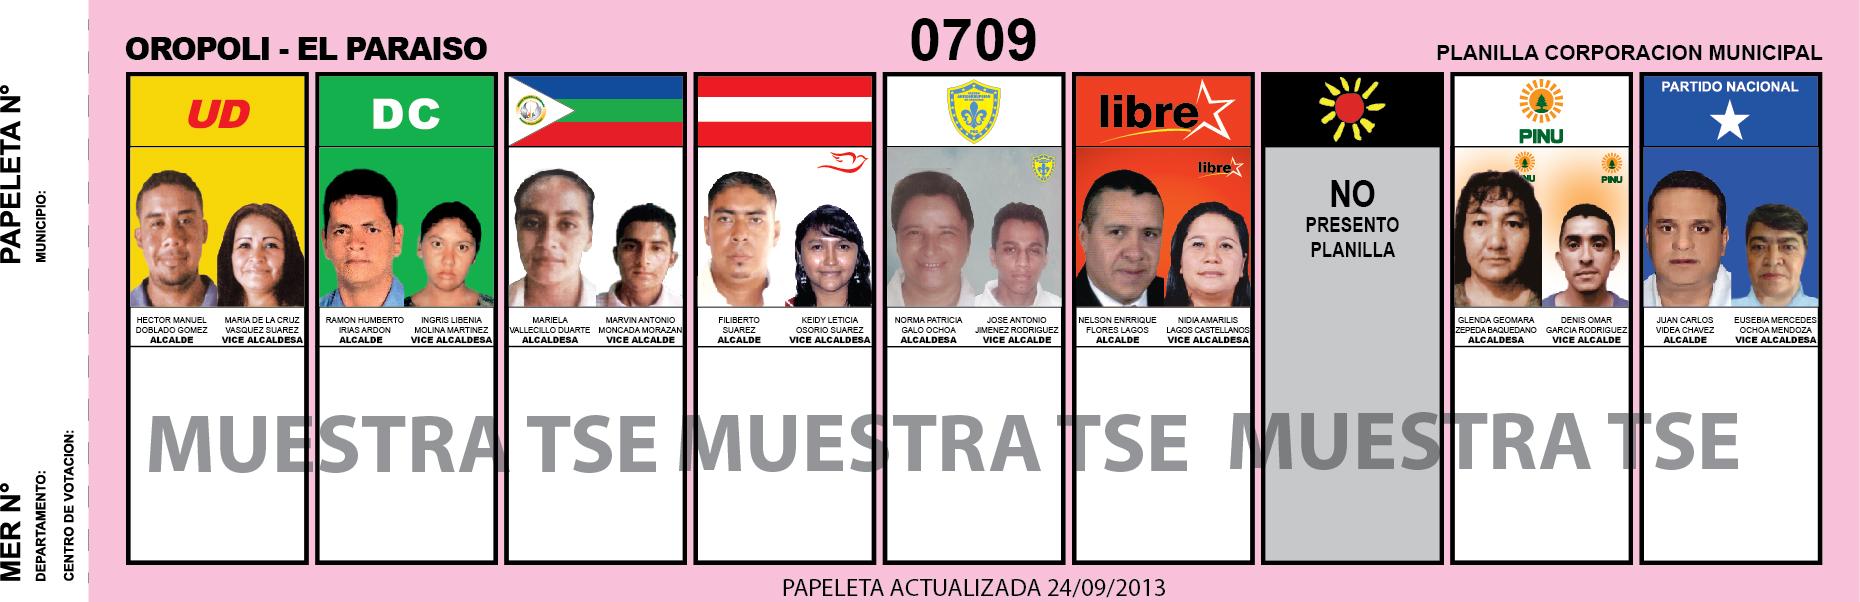 CANDIDATOS 2013 MUNICIPIO OROPOLI - EL PARAISO - HONDURAS